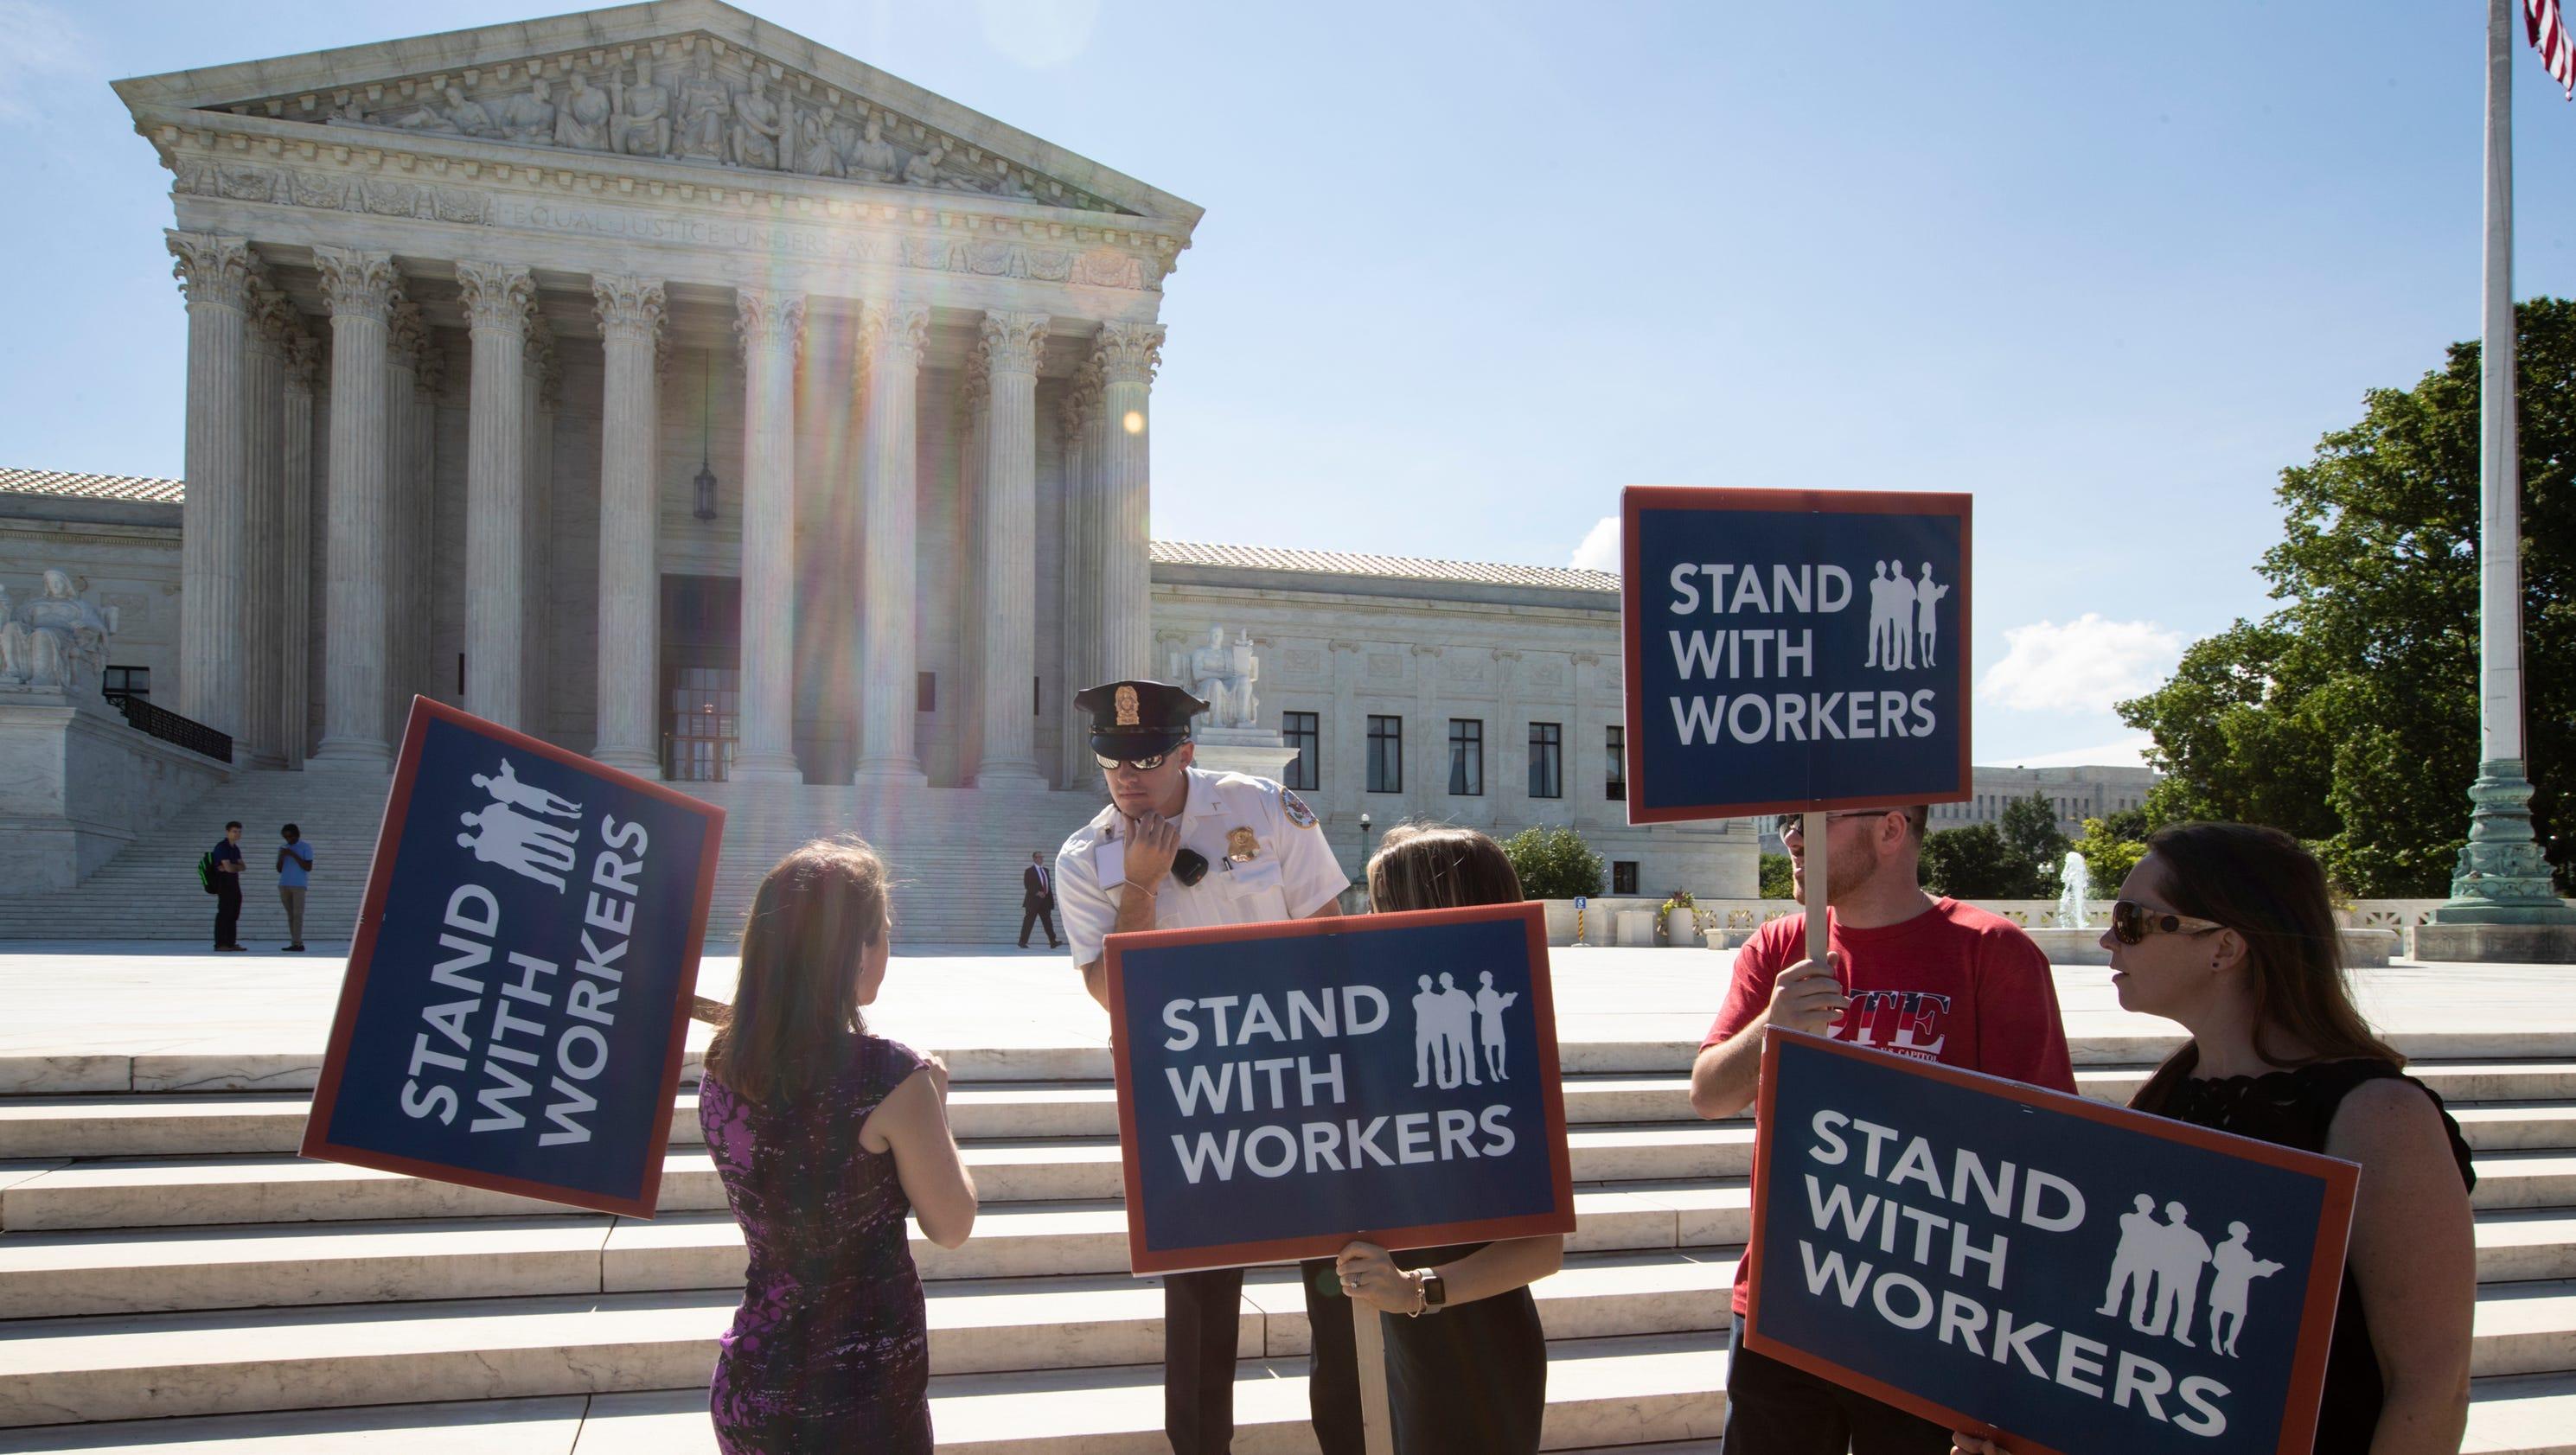 Supreme Court deals major financial blow to nation's public employee unions